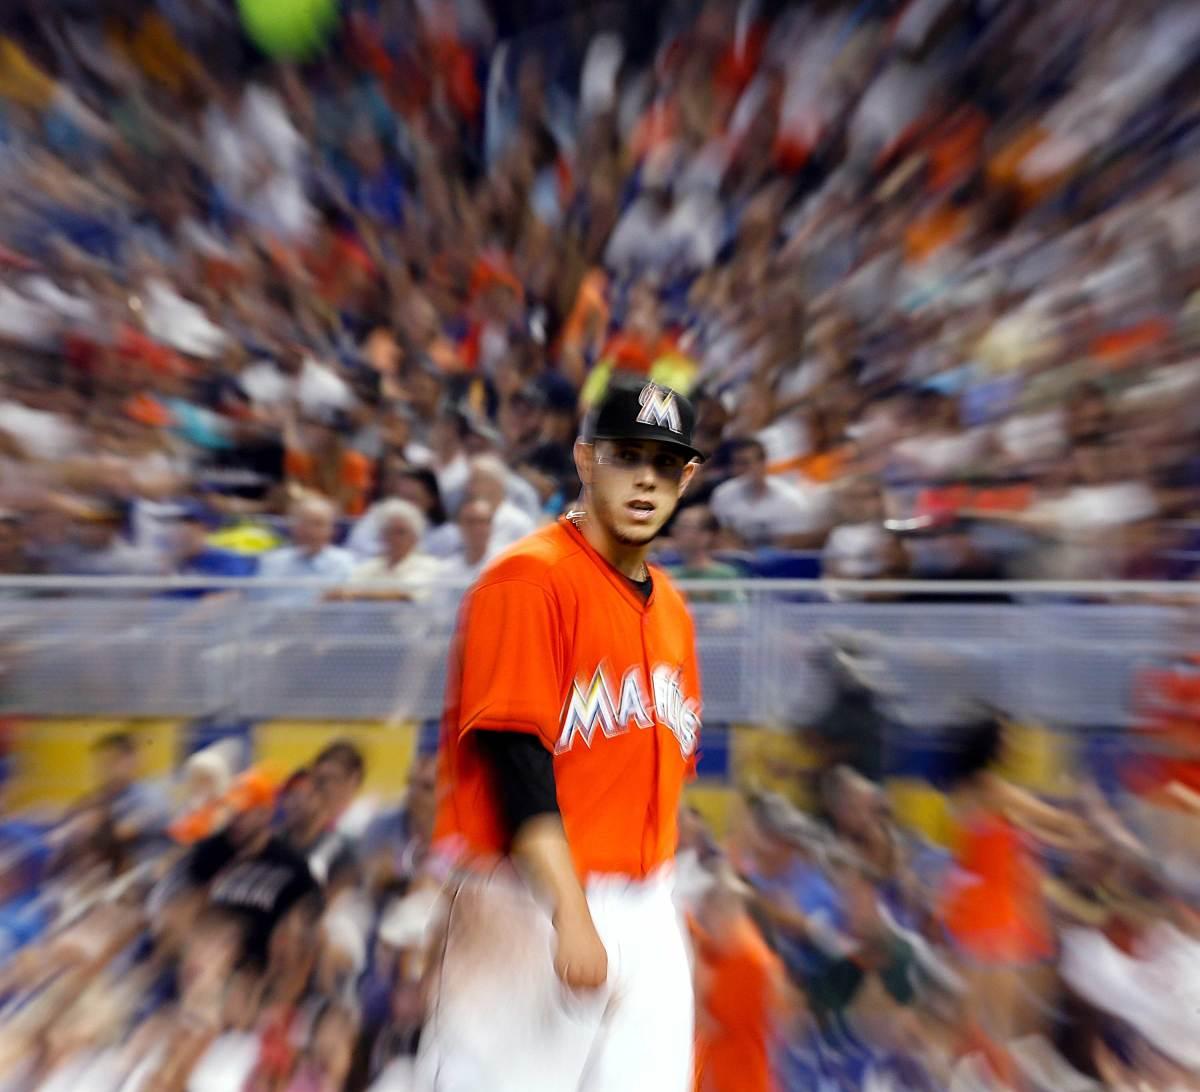 Jose-Fernandez-Florida-Marlins-8.jpg